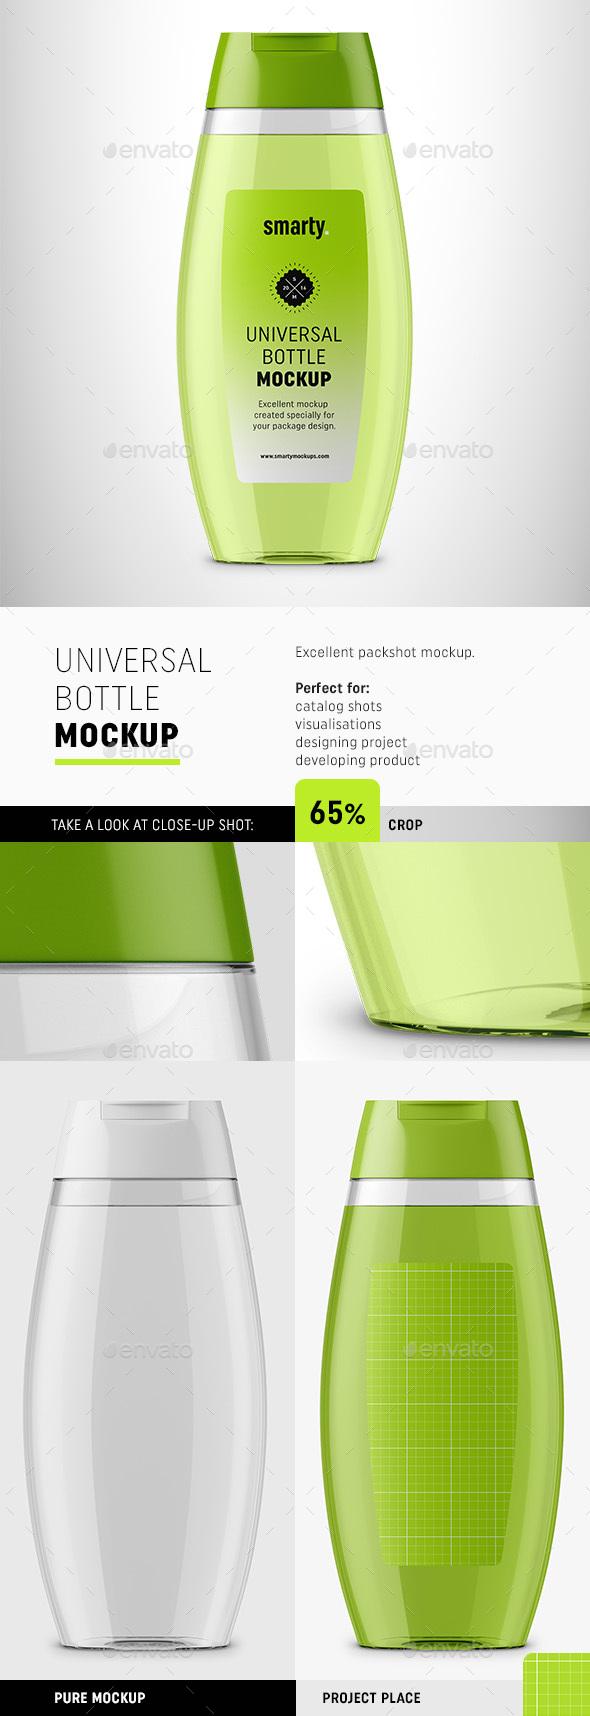 Transparent Bottle Mockup - Beauty Packaging